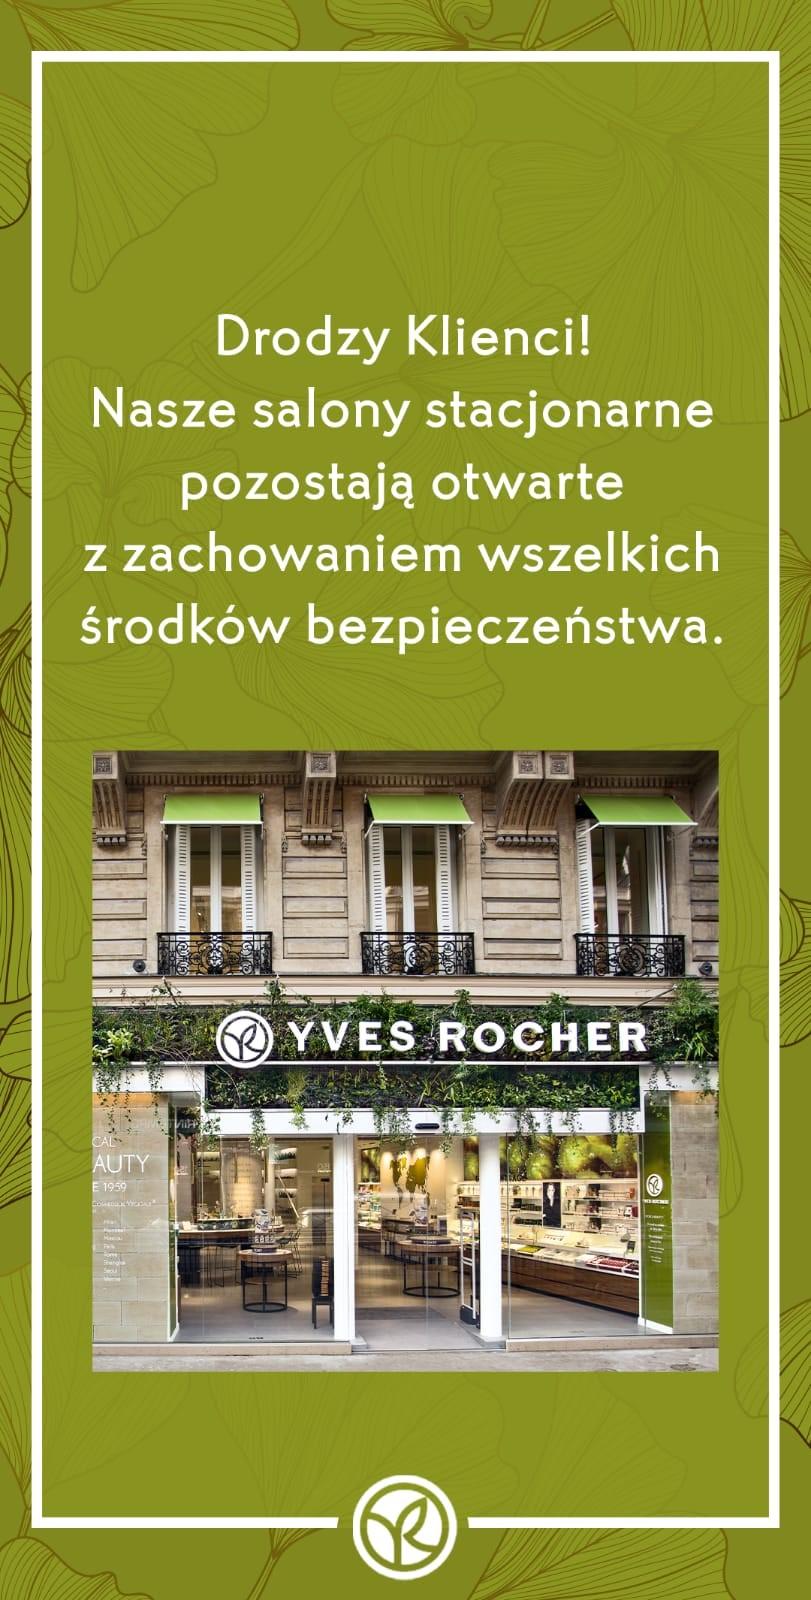 Yves Rocher Sosnowiec Plejada